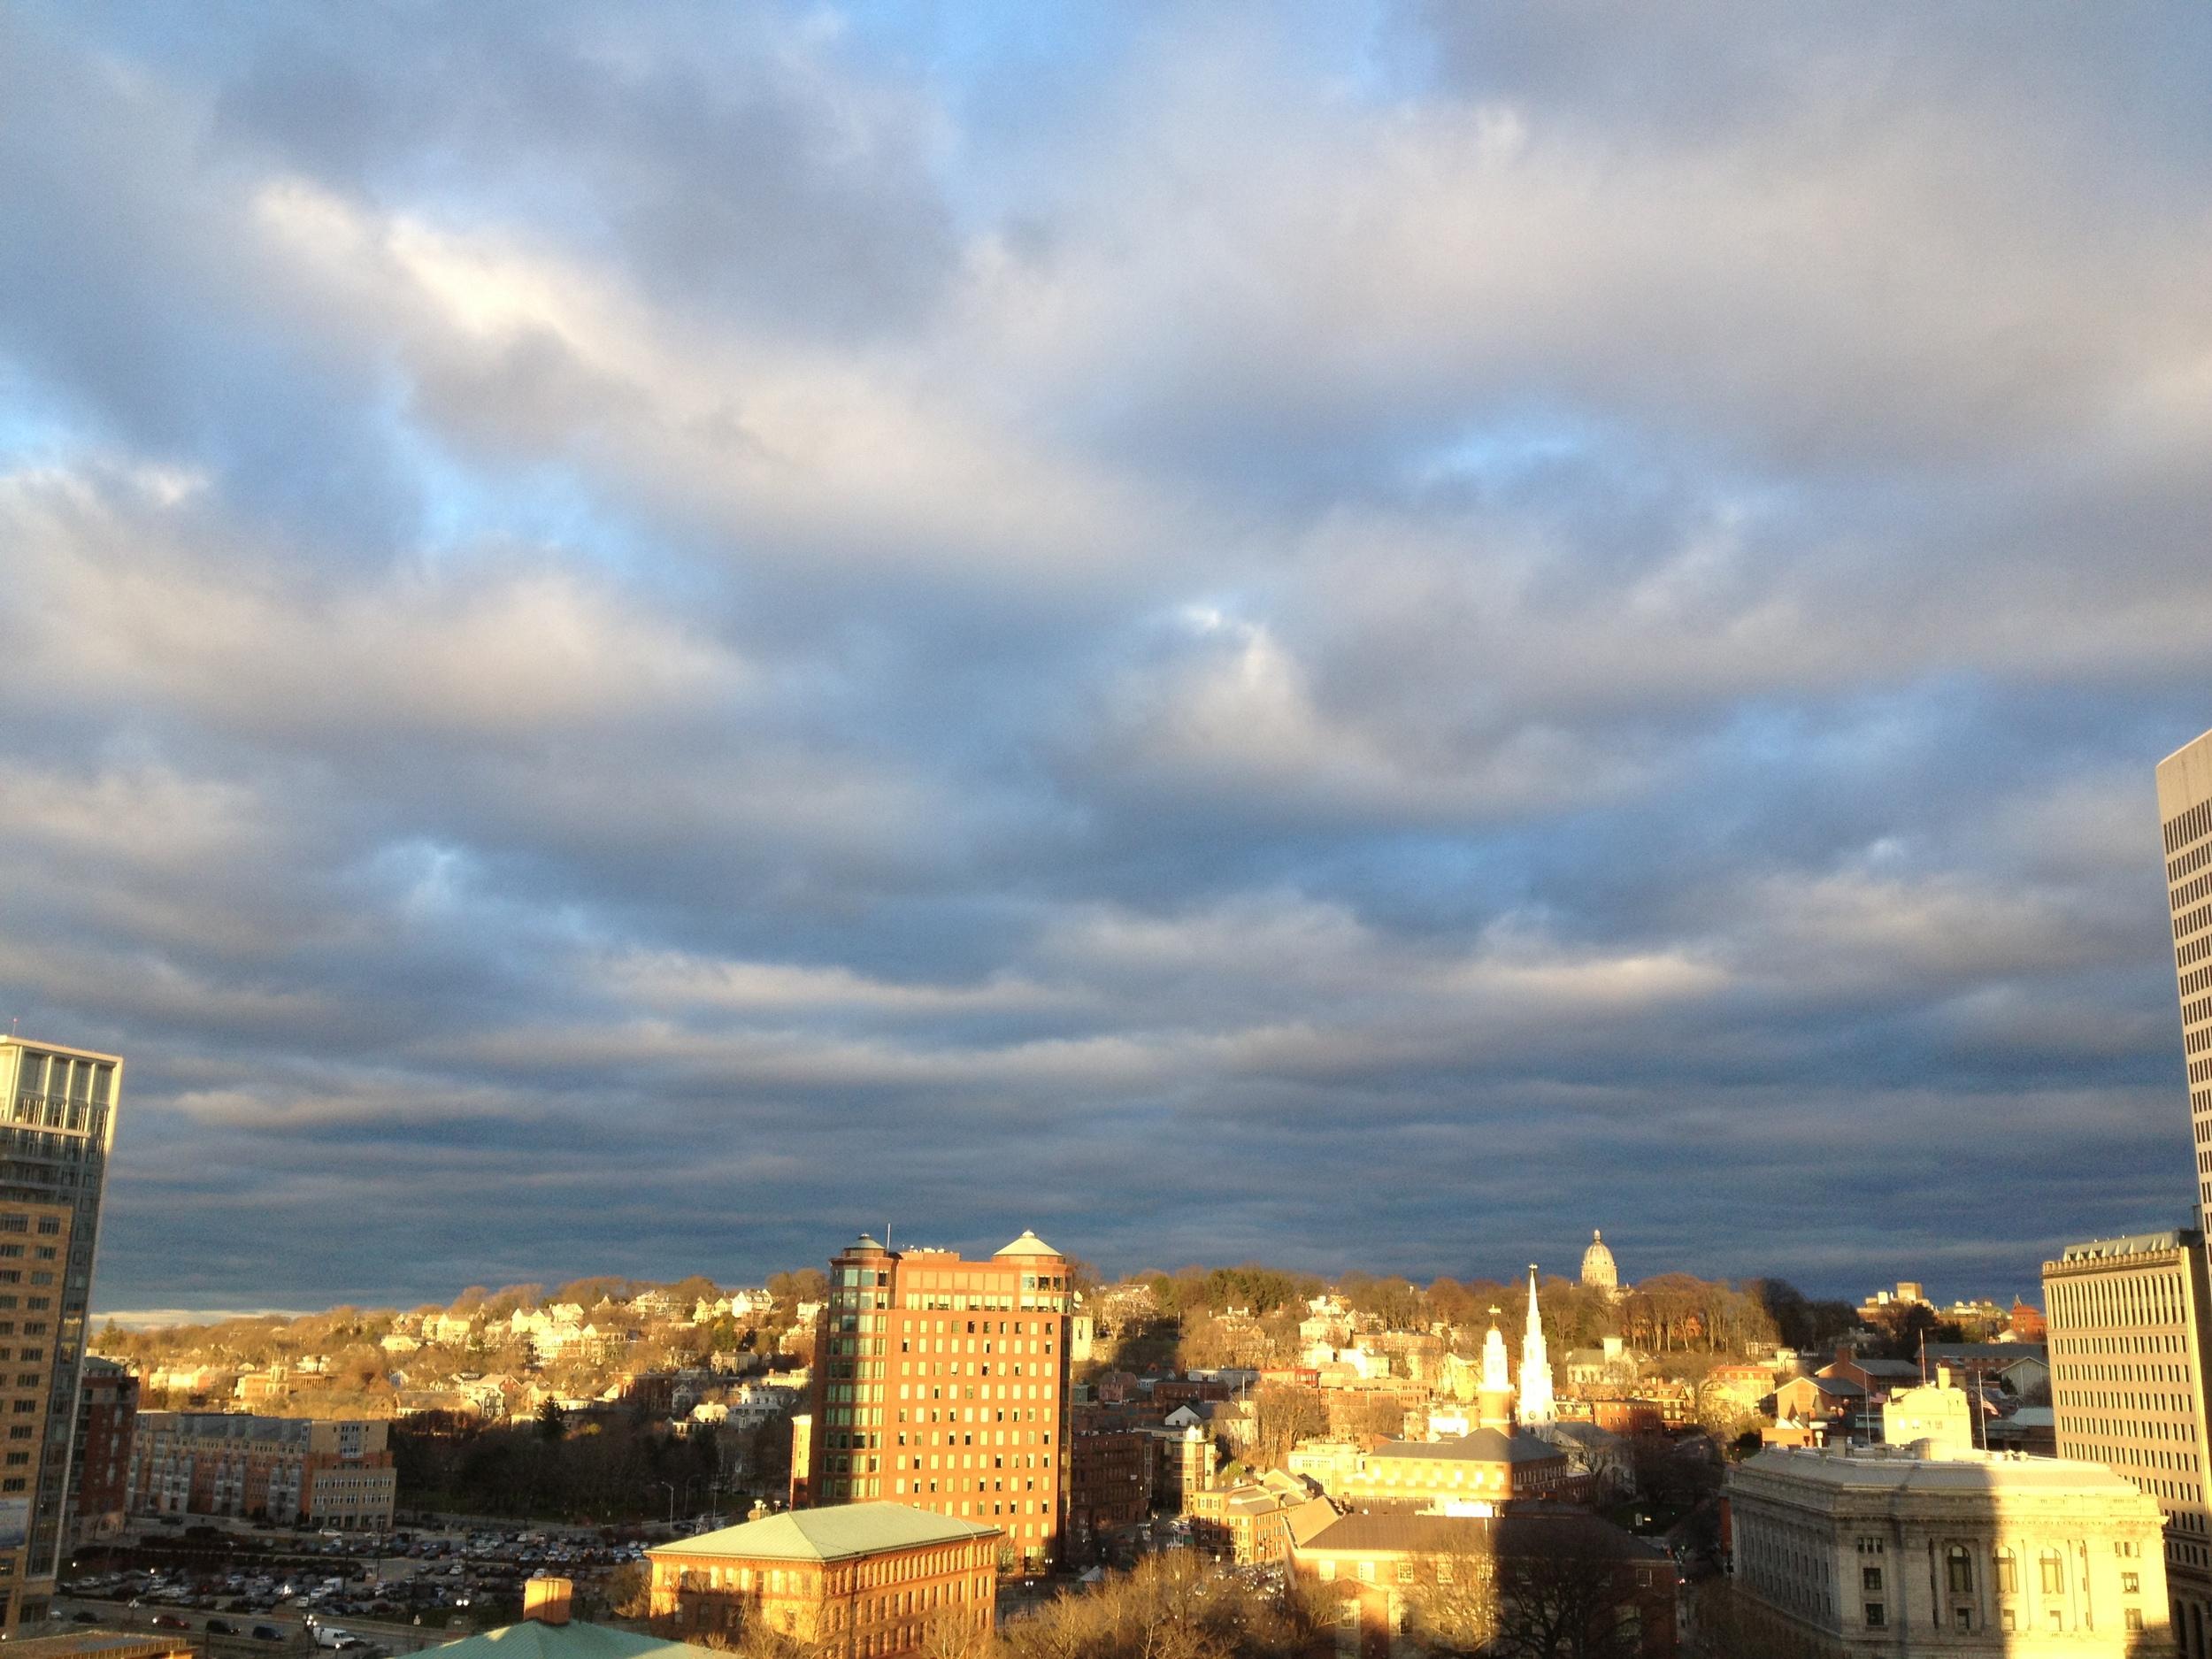 Providence, RI, 12-19-12